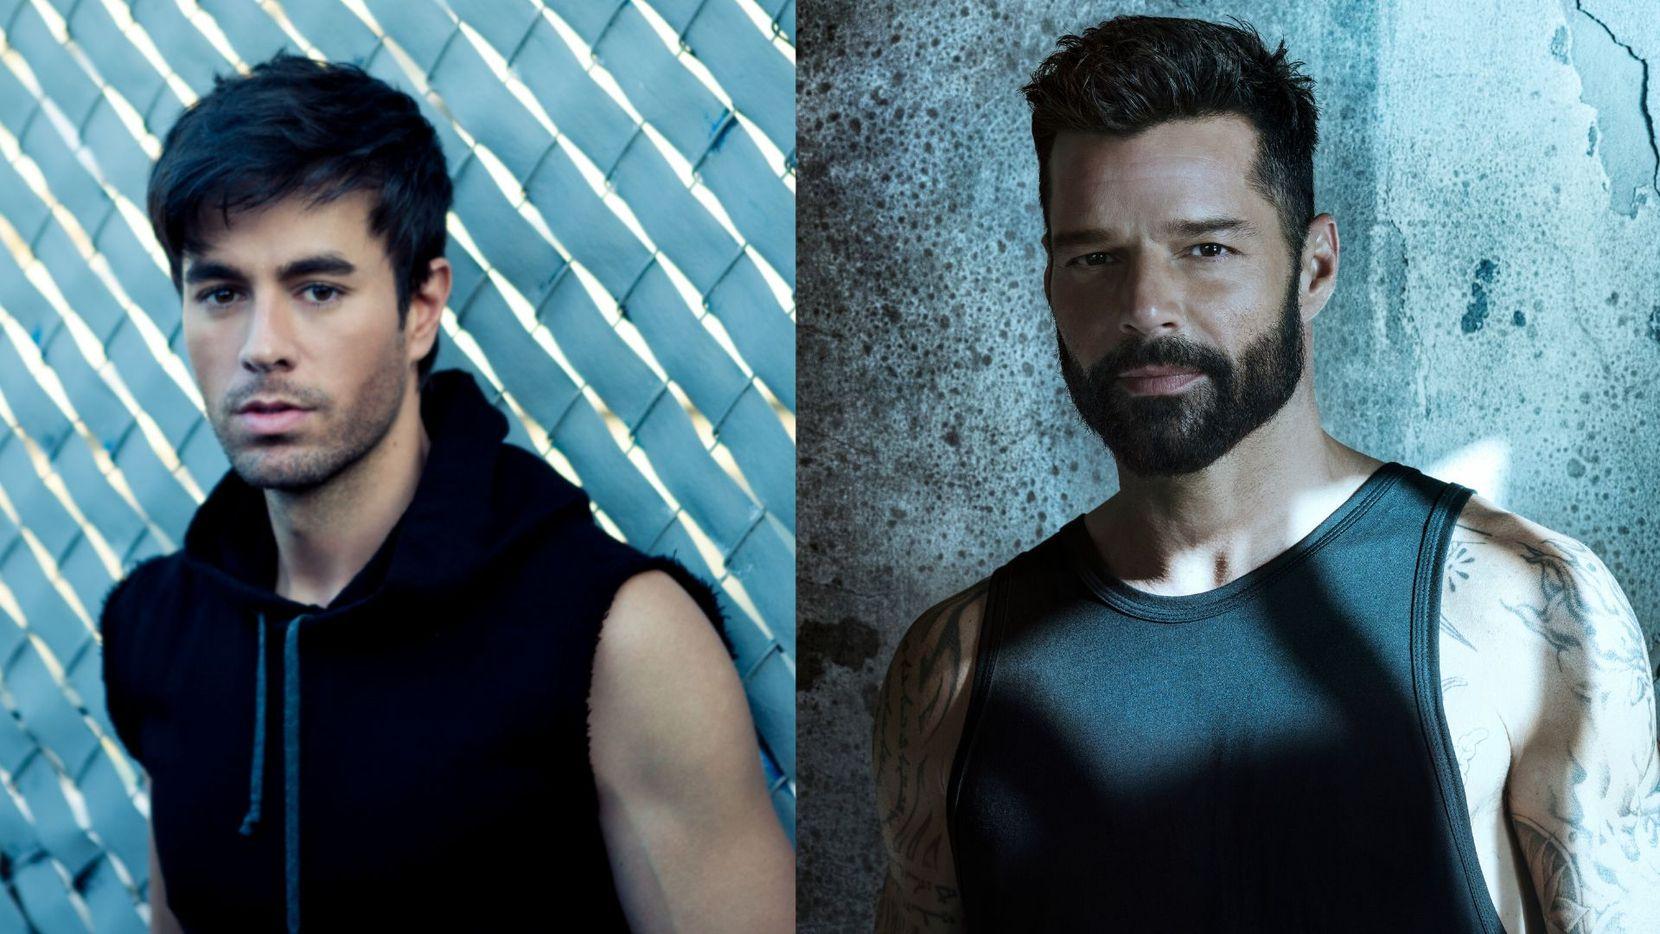 Enrique Iglesias y Ricky Martin traen gira conjunta a Dallas